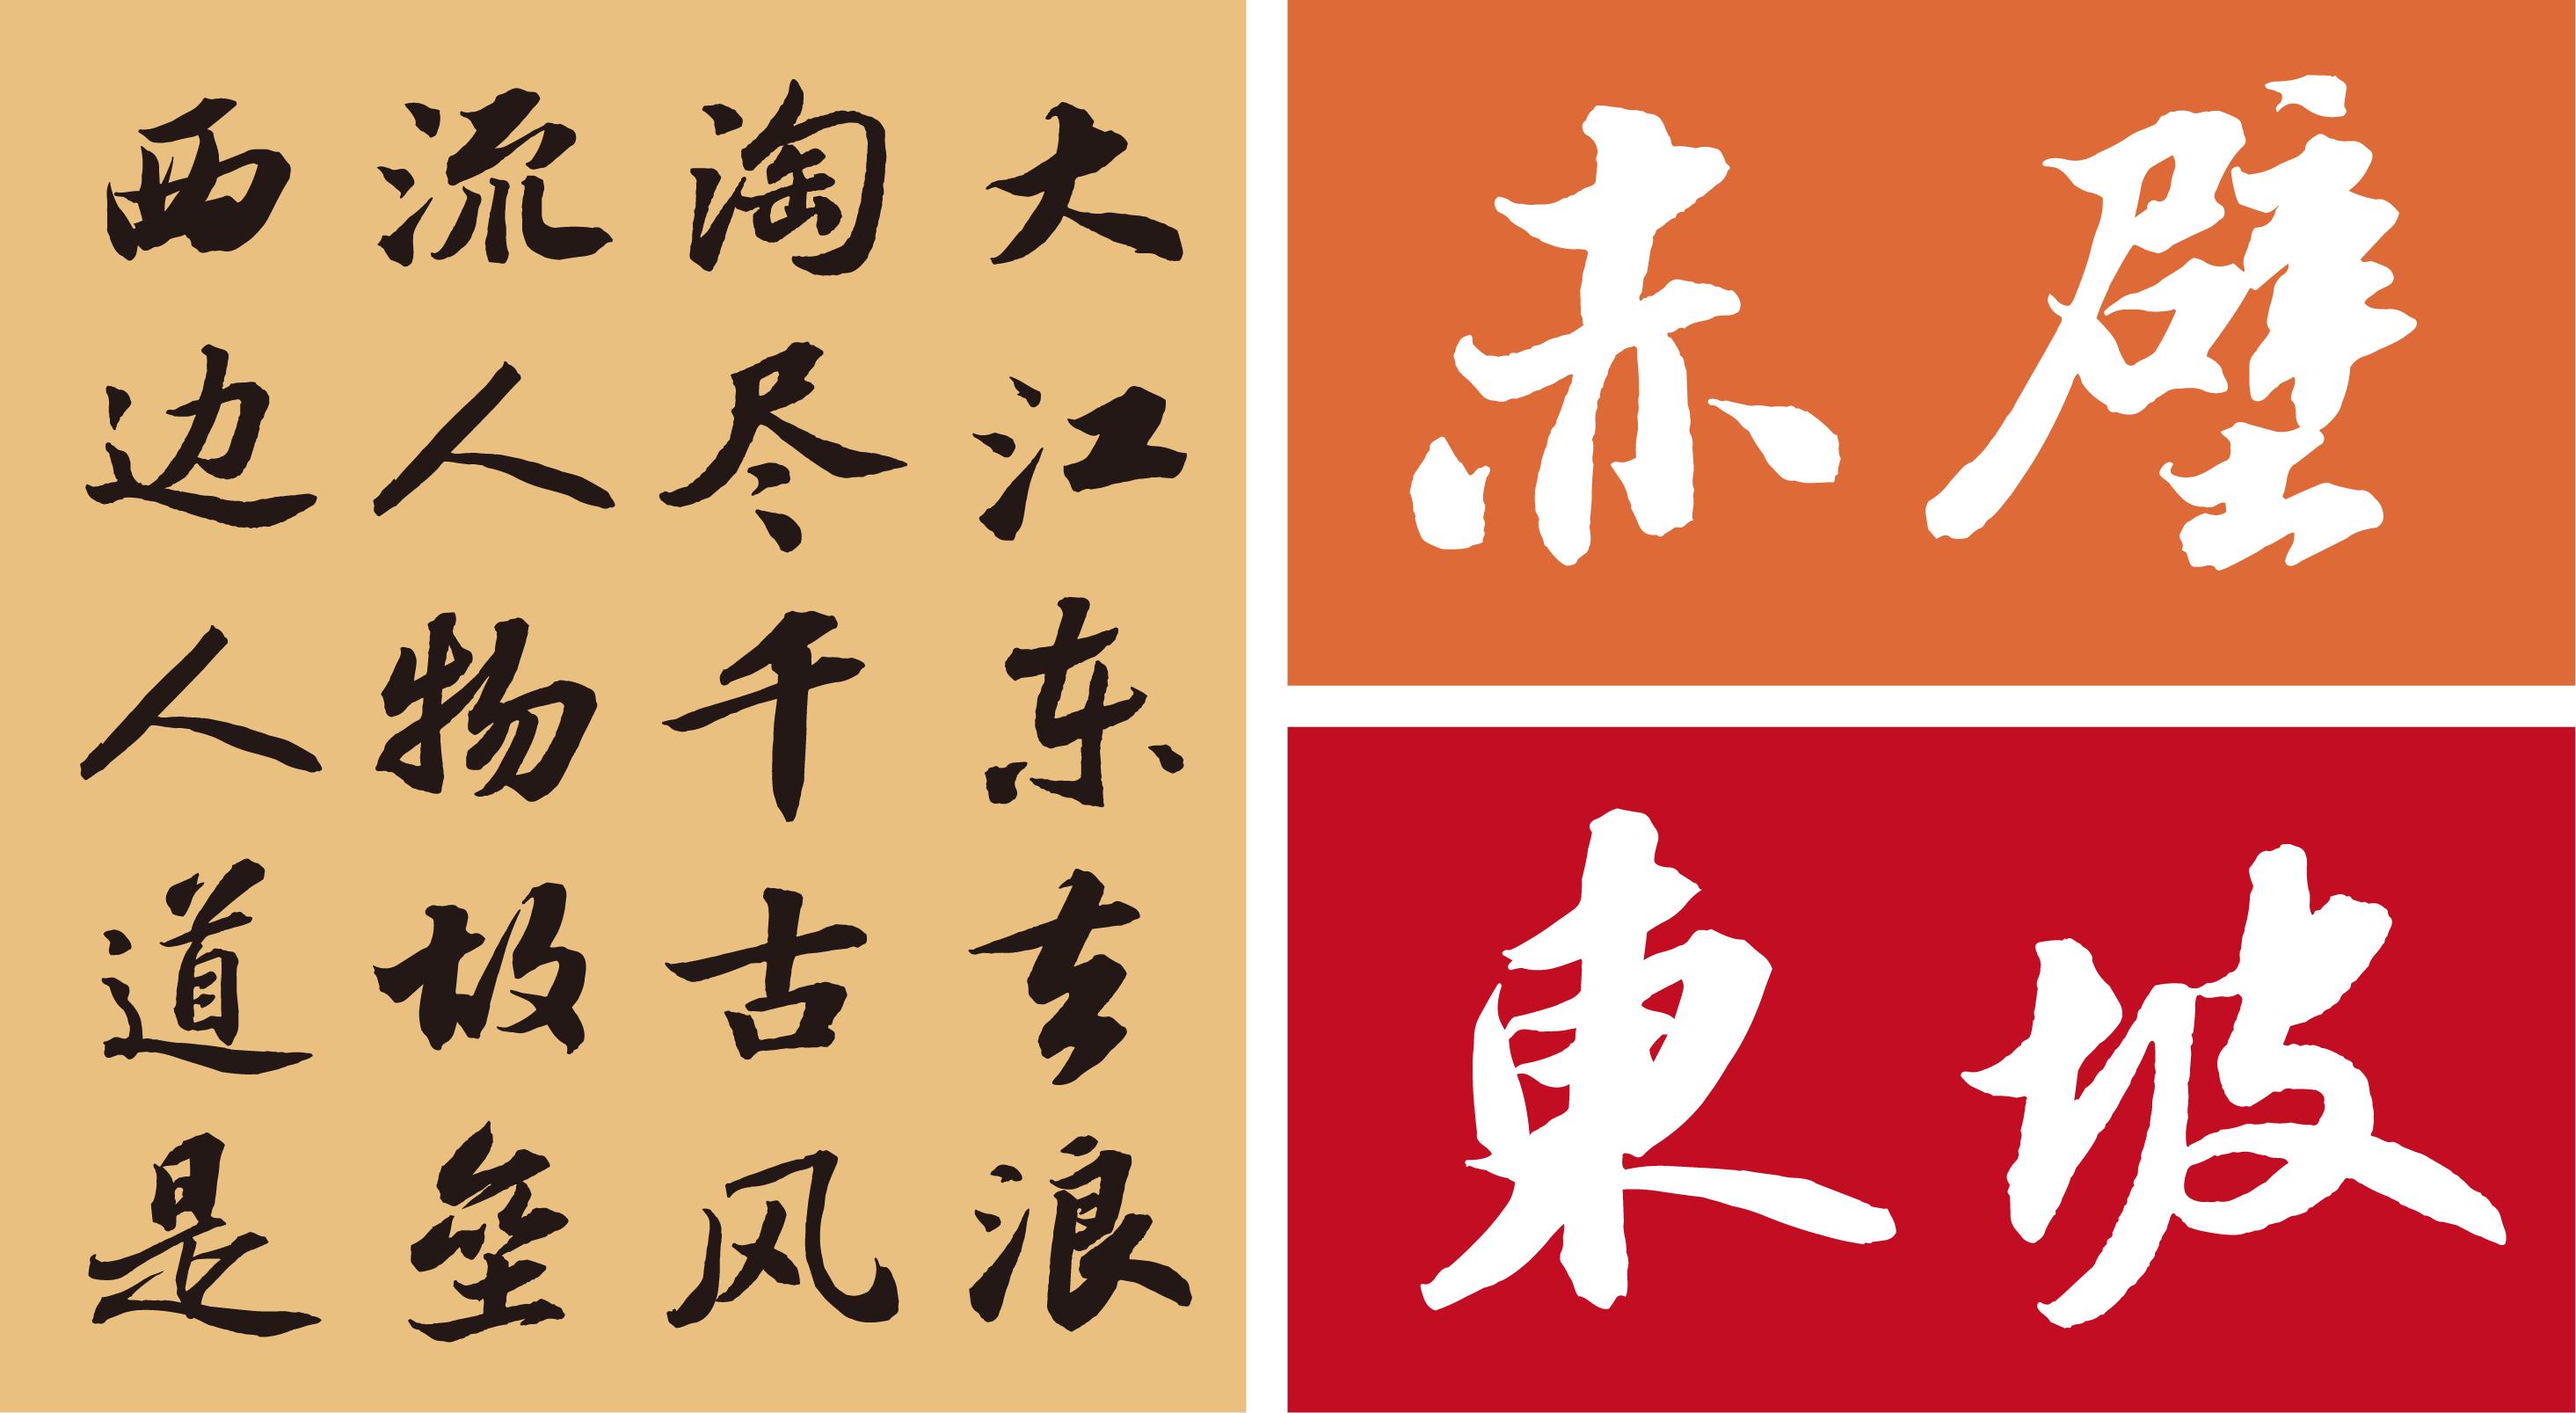 https://ft-bk1.oss-cn-zhangjiakou.aliyuncs.com/Public/Uploads/img/n_content_20201210174810_1438.png